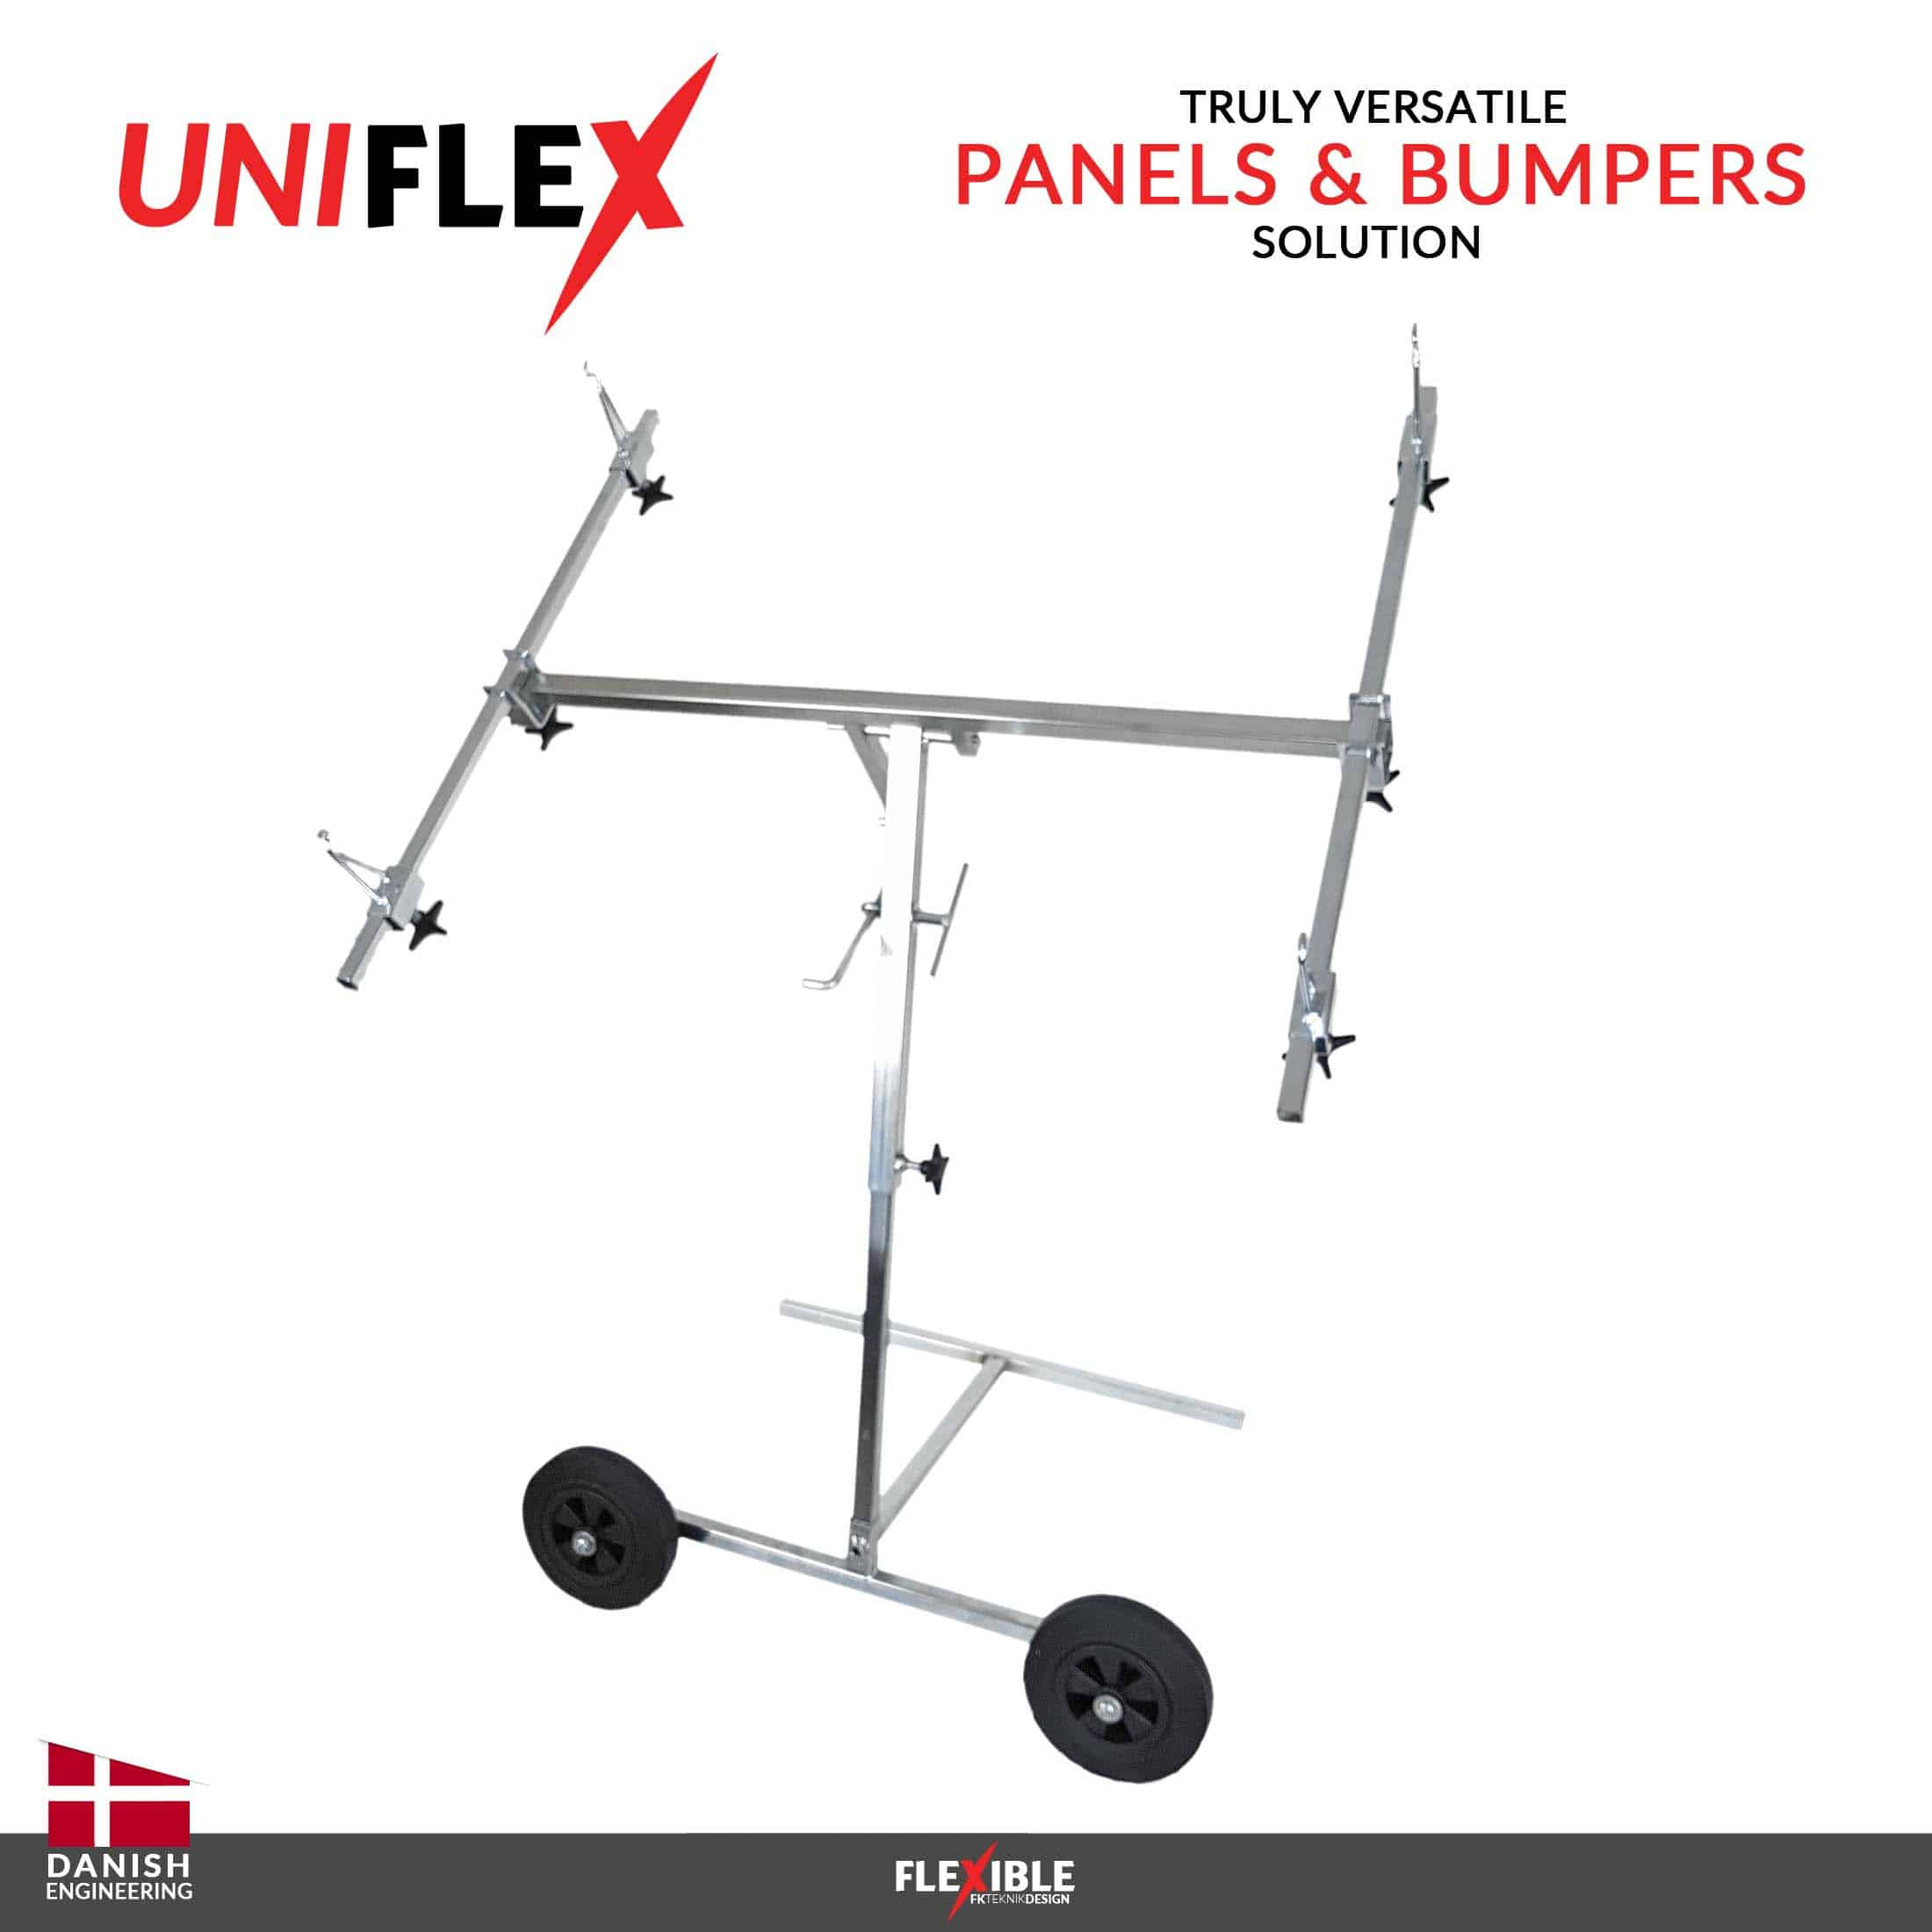 Uniflex paint stand Front View